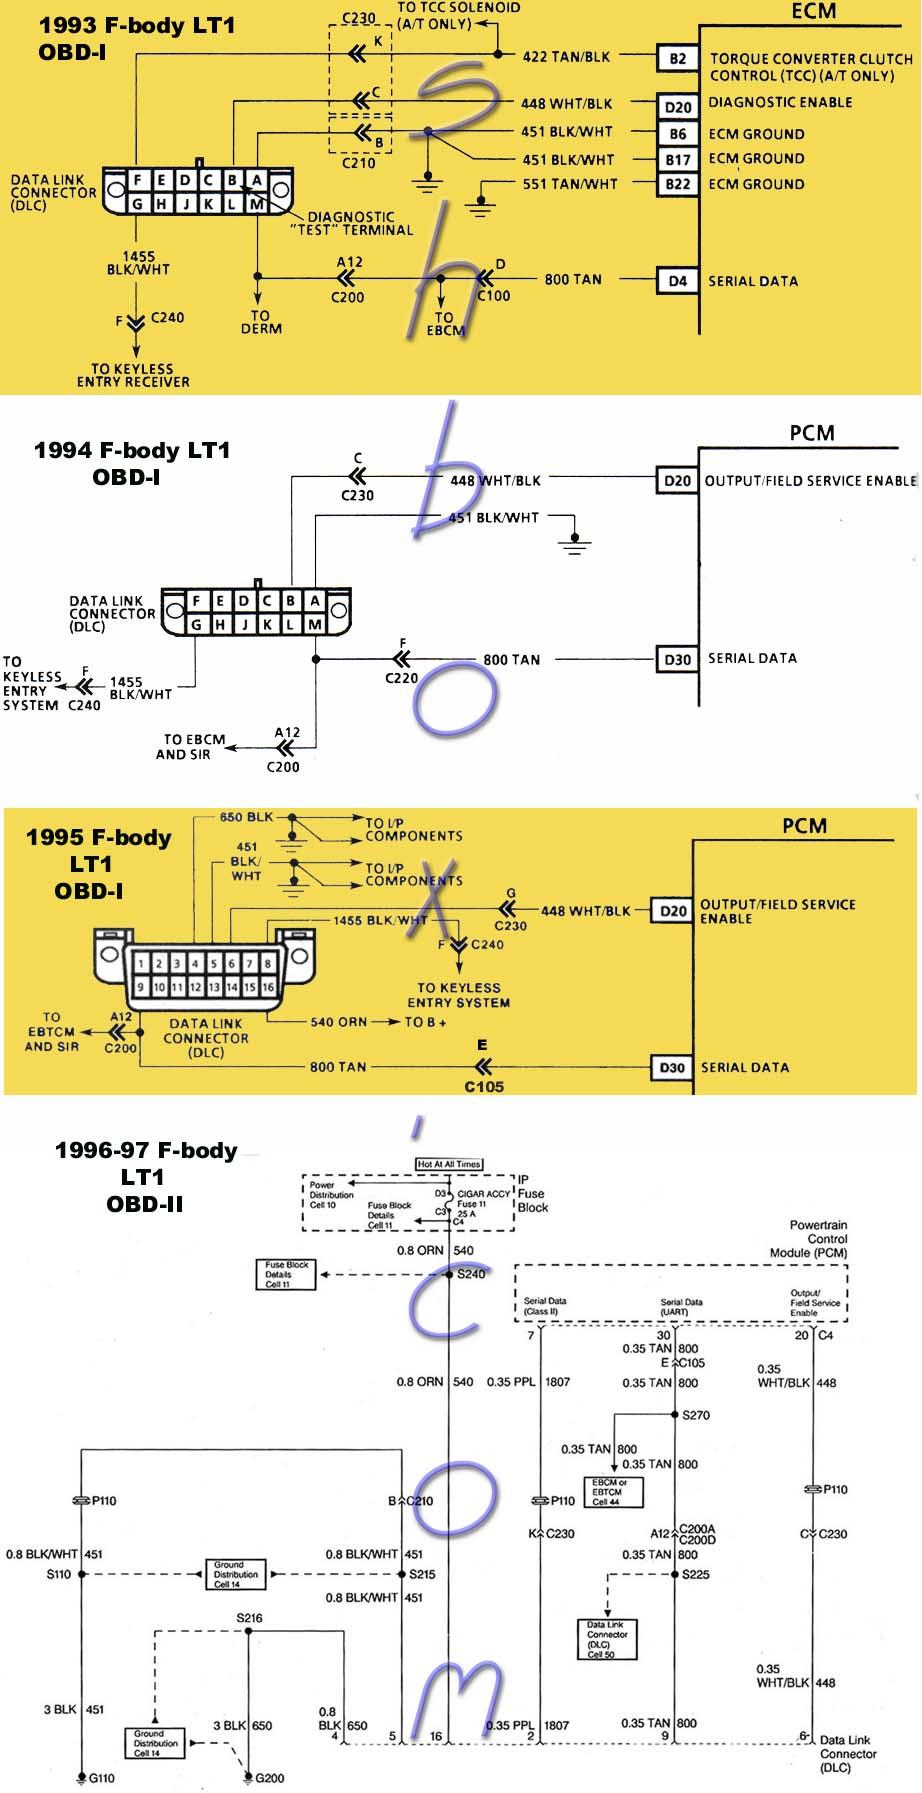 obd2 to obd1 wiring diagram me 5873  obd2 connector wiring diagram wiring diagram  obd2 connector wiring diagram wiring